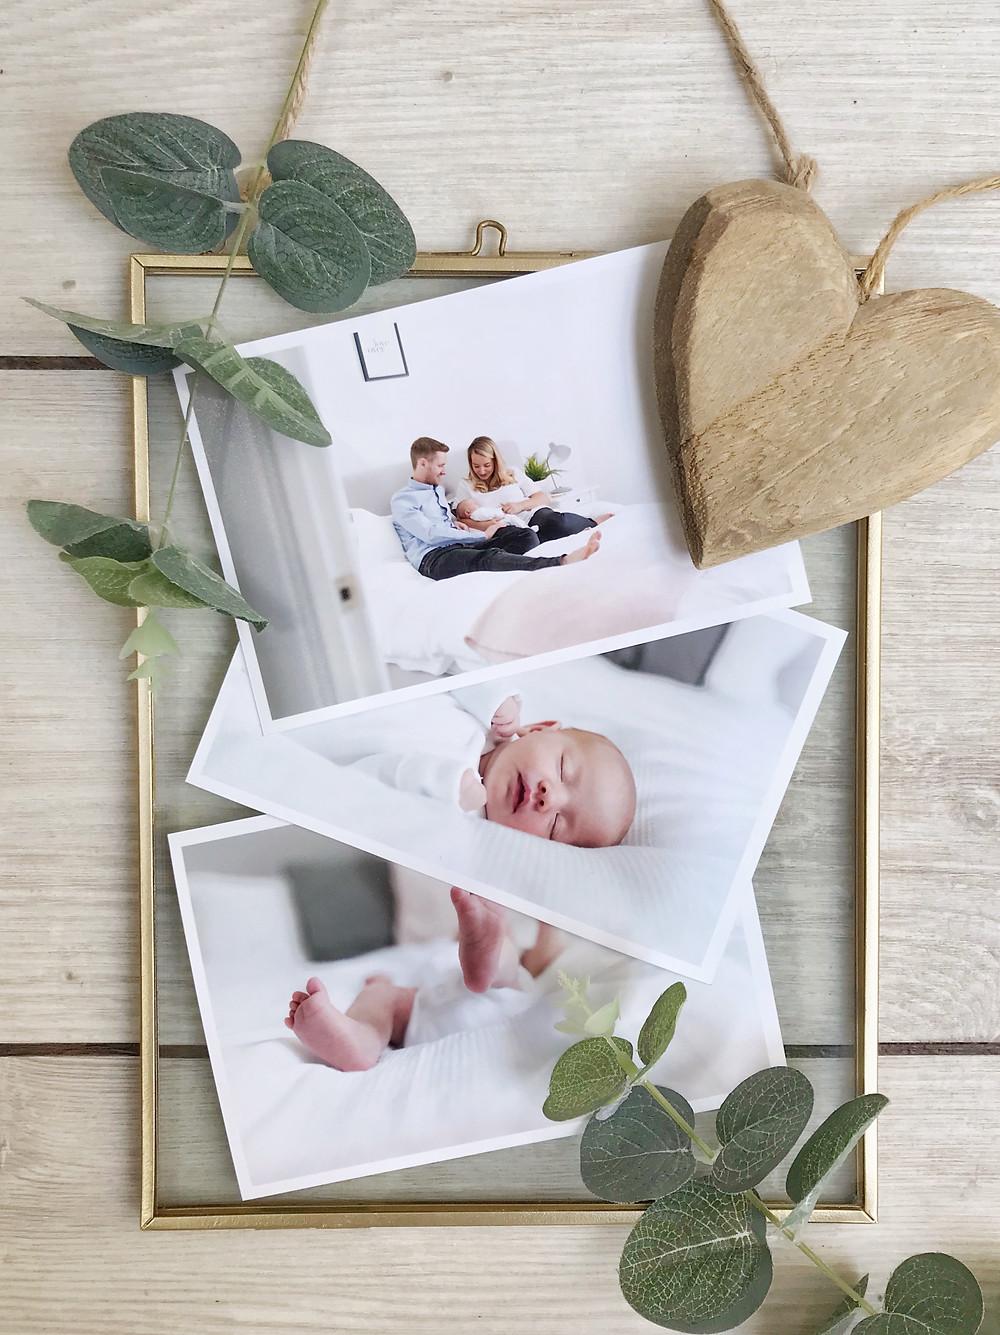 Photographer Southampton, family photographer southampton, southampton family photographer, Southampton newborn photographer ,Southampton family photographer , Southampton maternity photographer